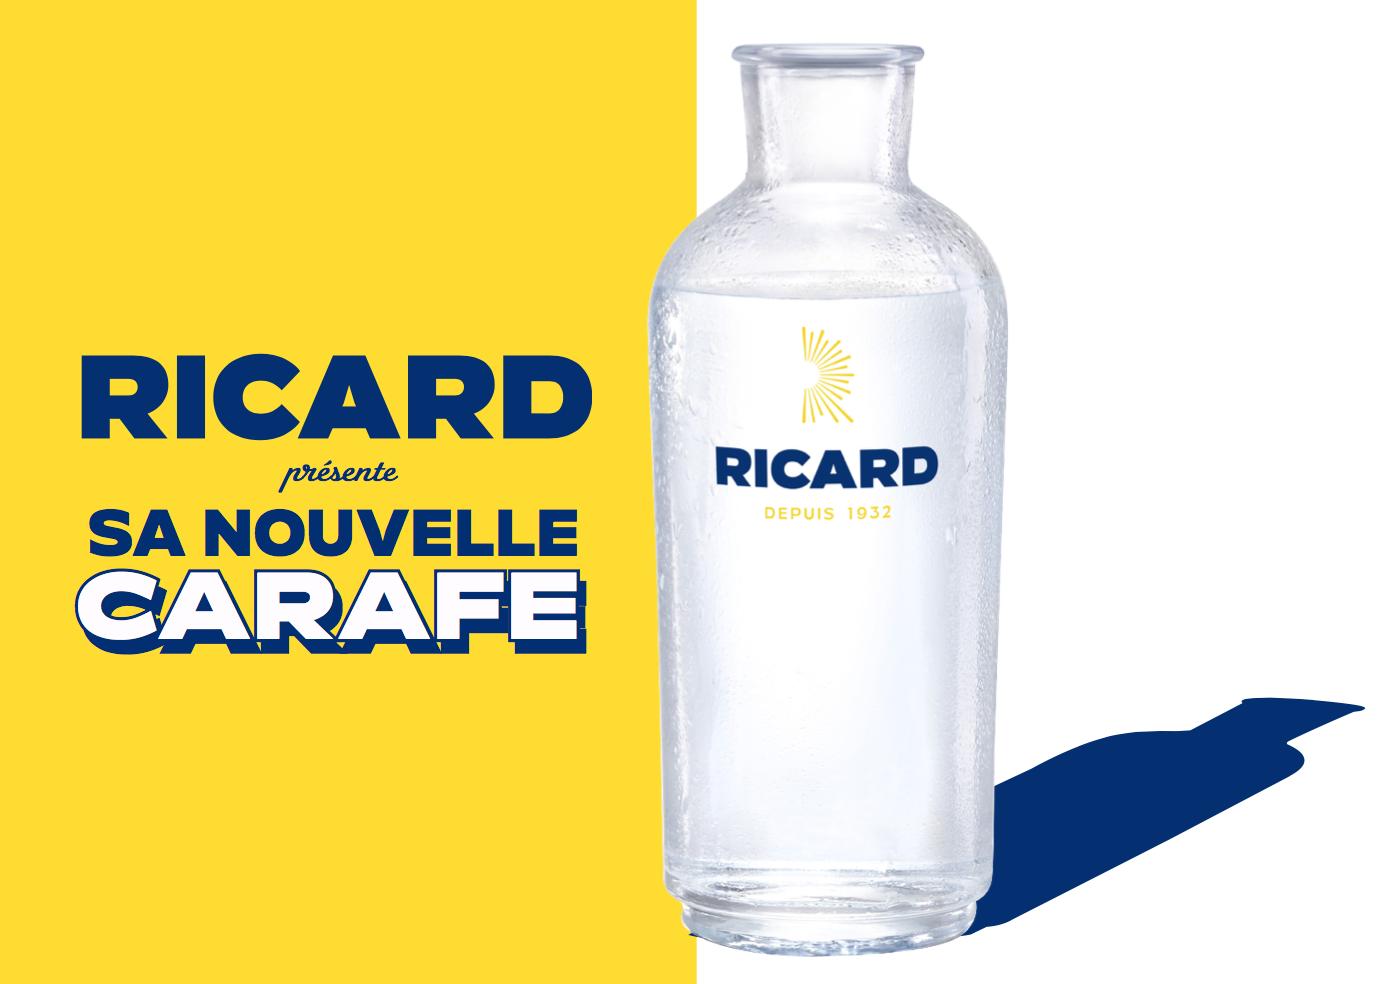 ricard-carafe